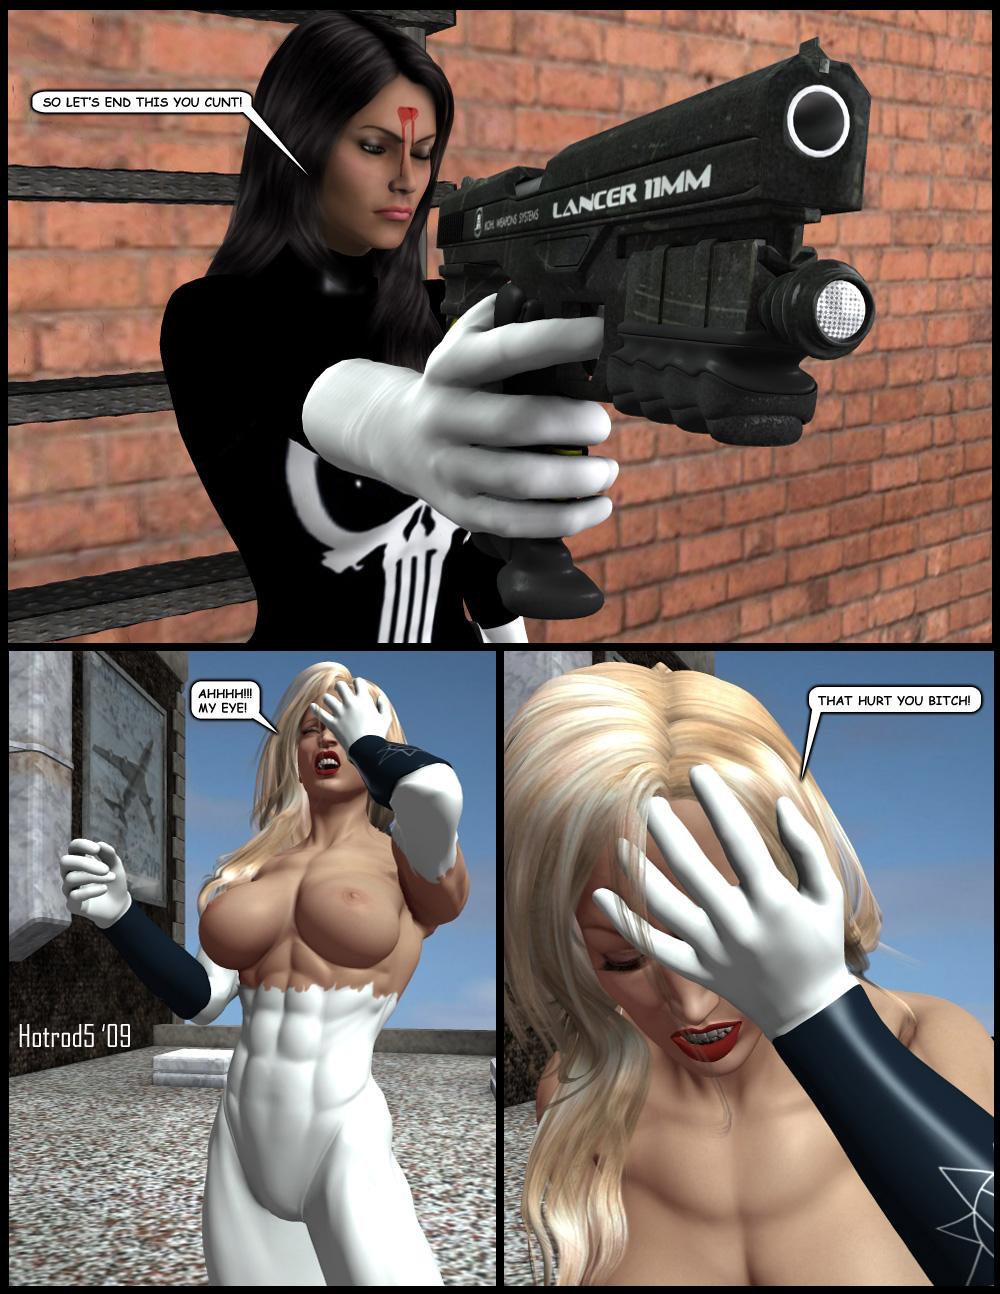 Ultrawoman vs LFP Pg08 by hotrod5 Etiquetas: Chloroform, Danger Babe Central, Gas Mask, Nude, Superheroine